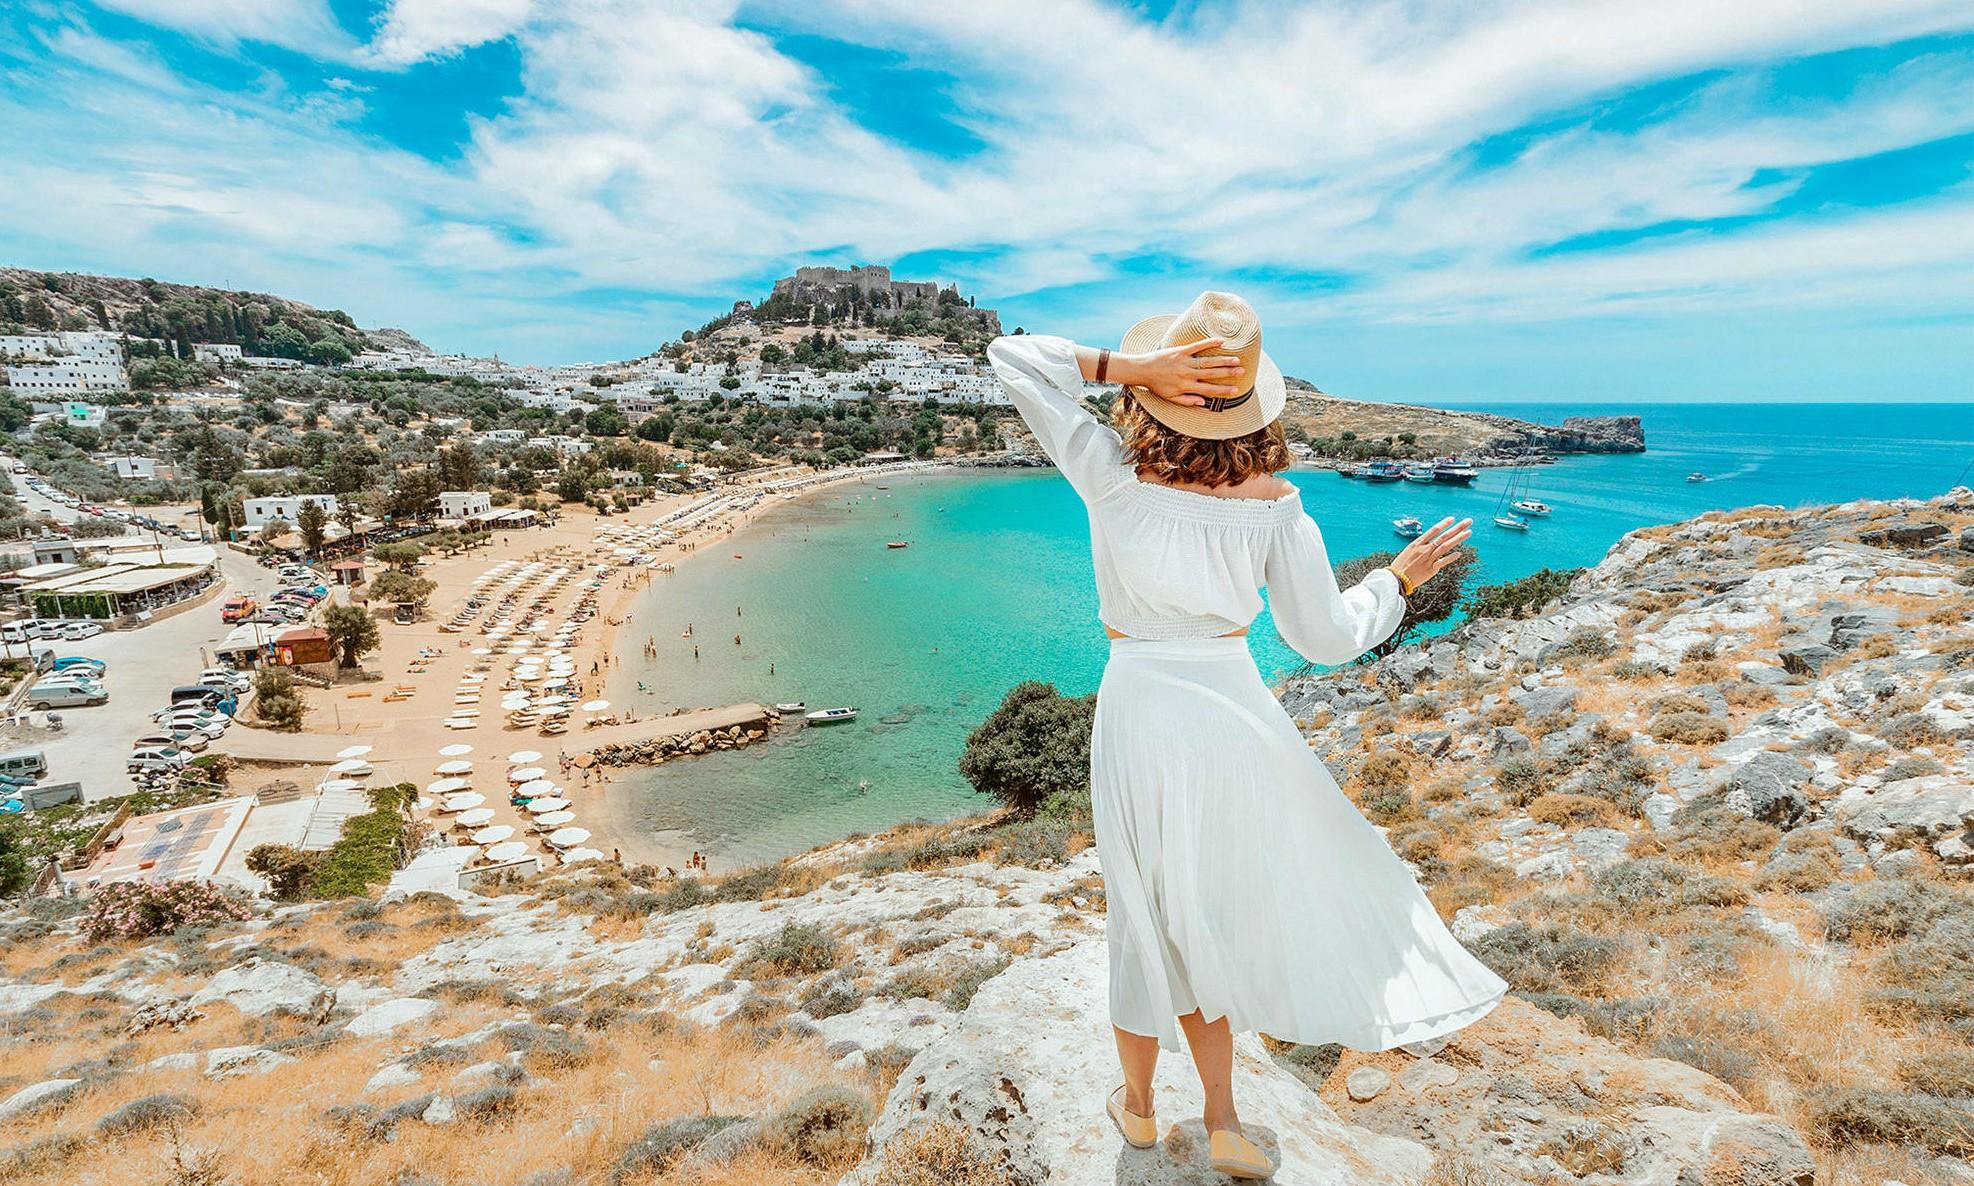 Греция | Топ-8 дешевых стран для жаркой зимовки | Brain Berries